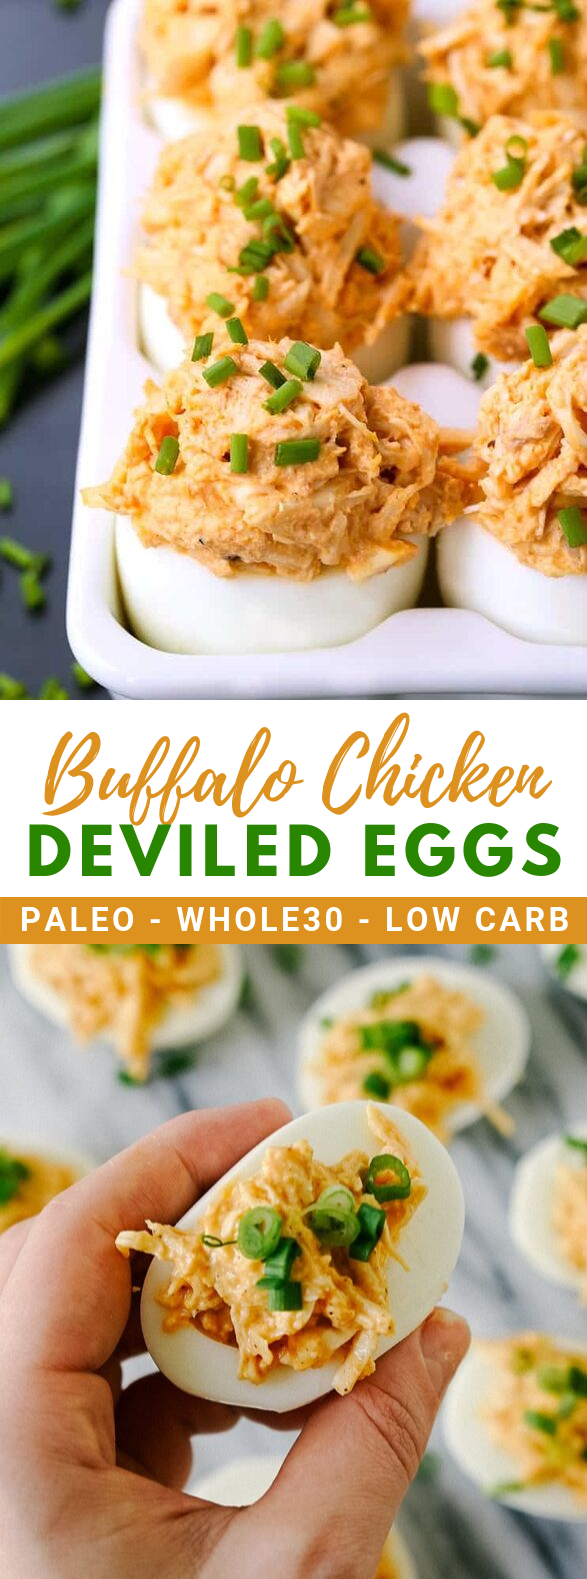 Buffalo Chicken Deviled Eggs #healthy #lowcarb